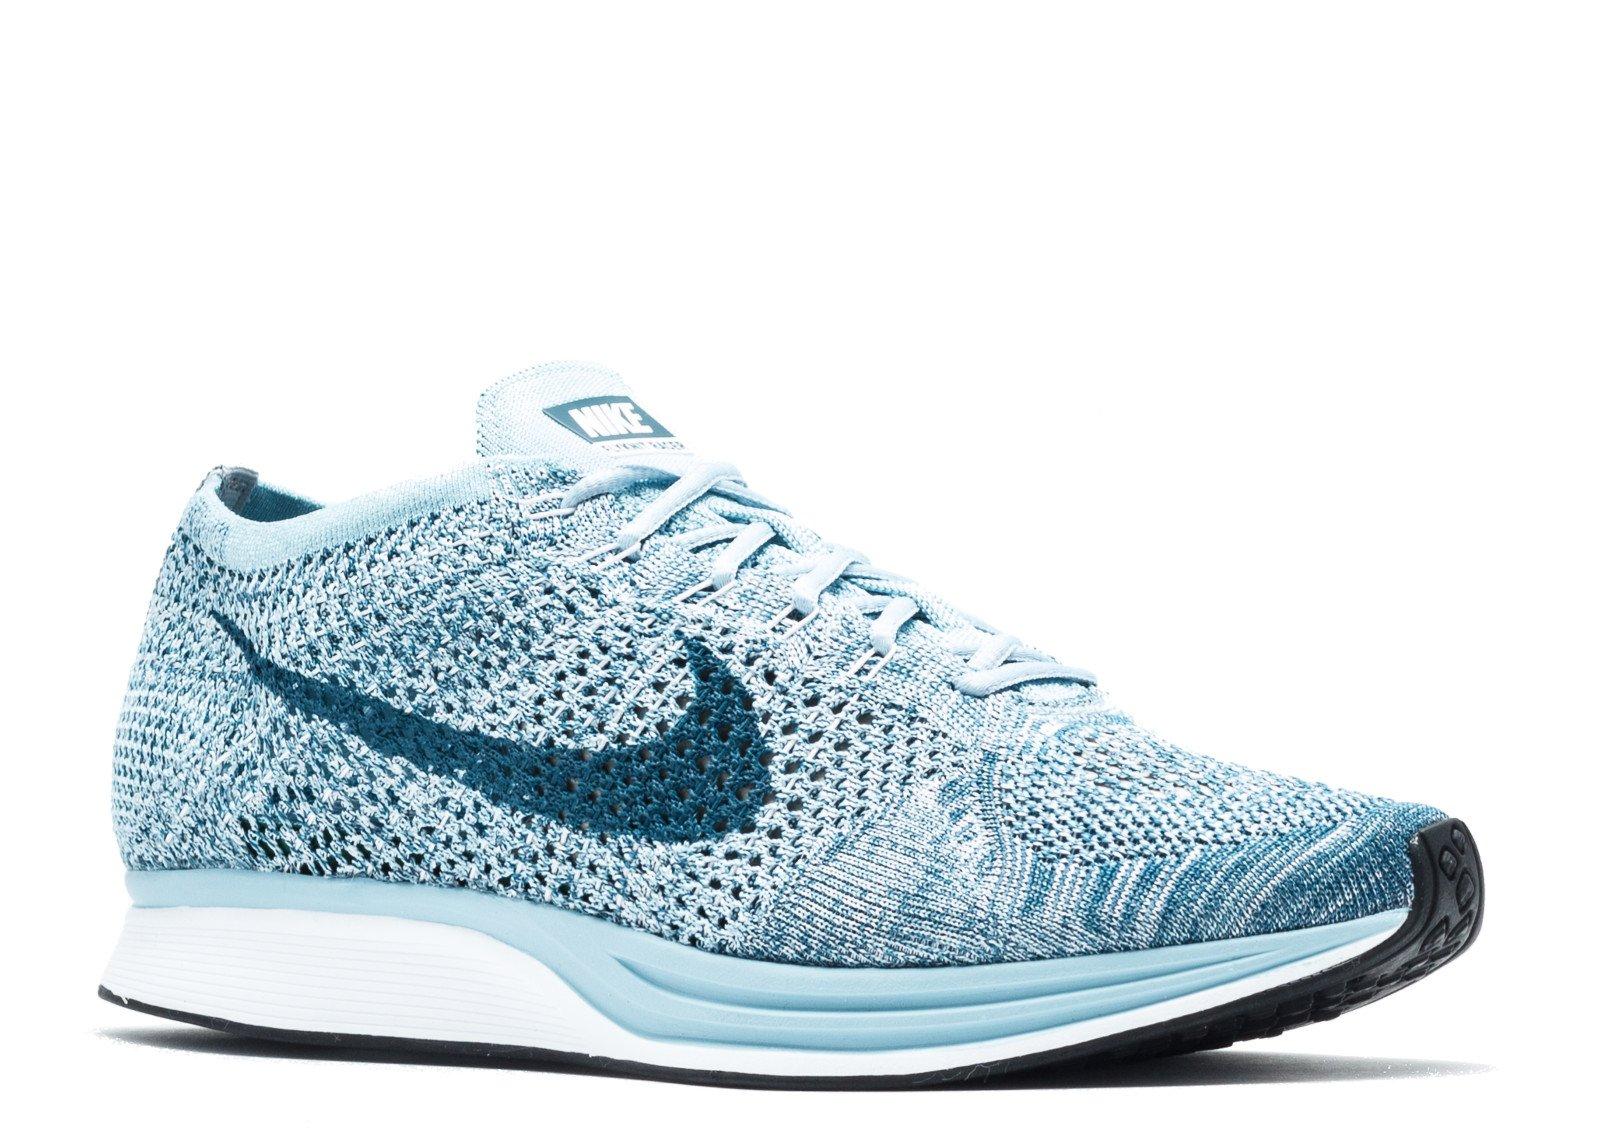 ec93333262e0 Galleon - Nike Men s Lunarepic Low Flyknit Running Shoes (10 M US ...